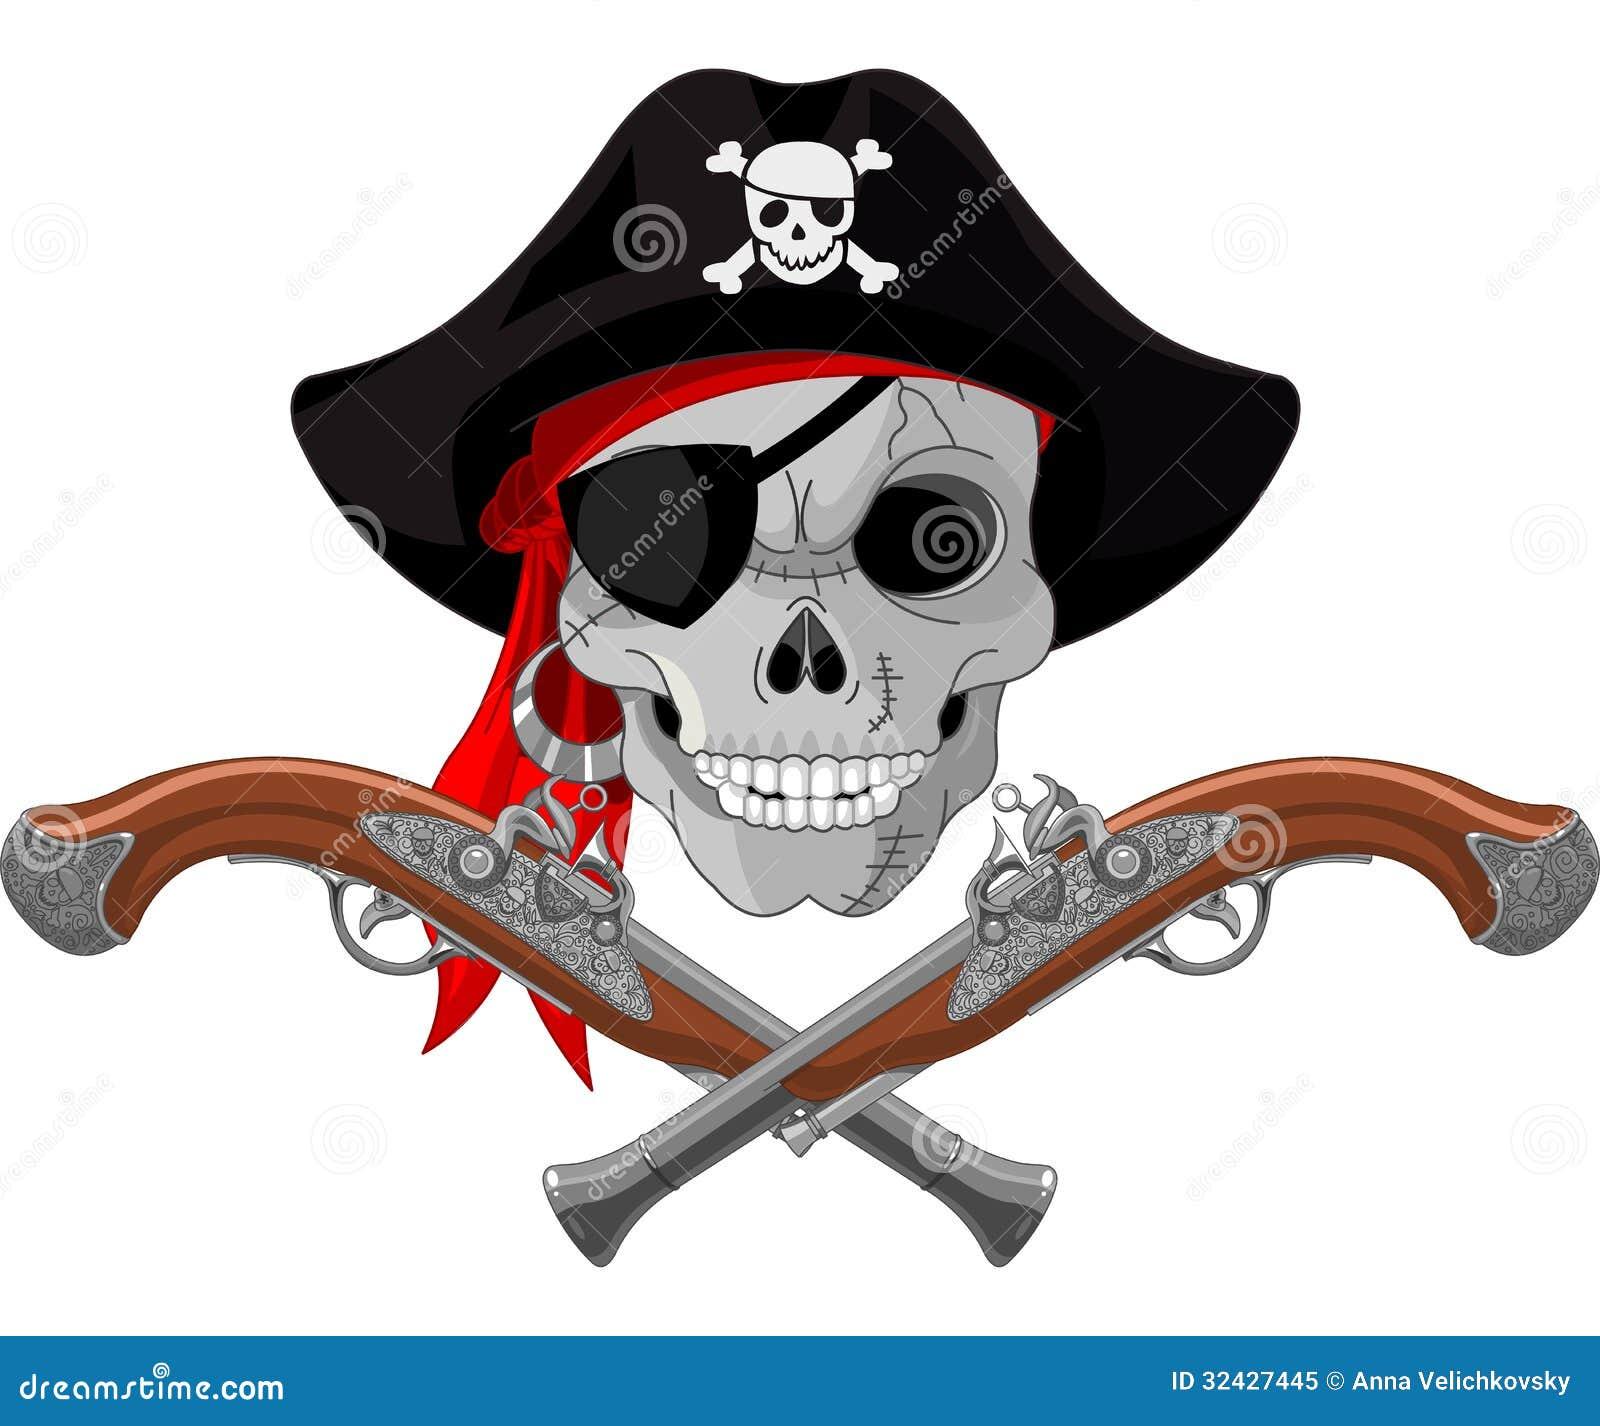 Pirate Skull And Guns Royalty Free Stock Photo - Image: 32427445